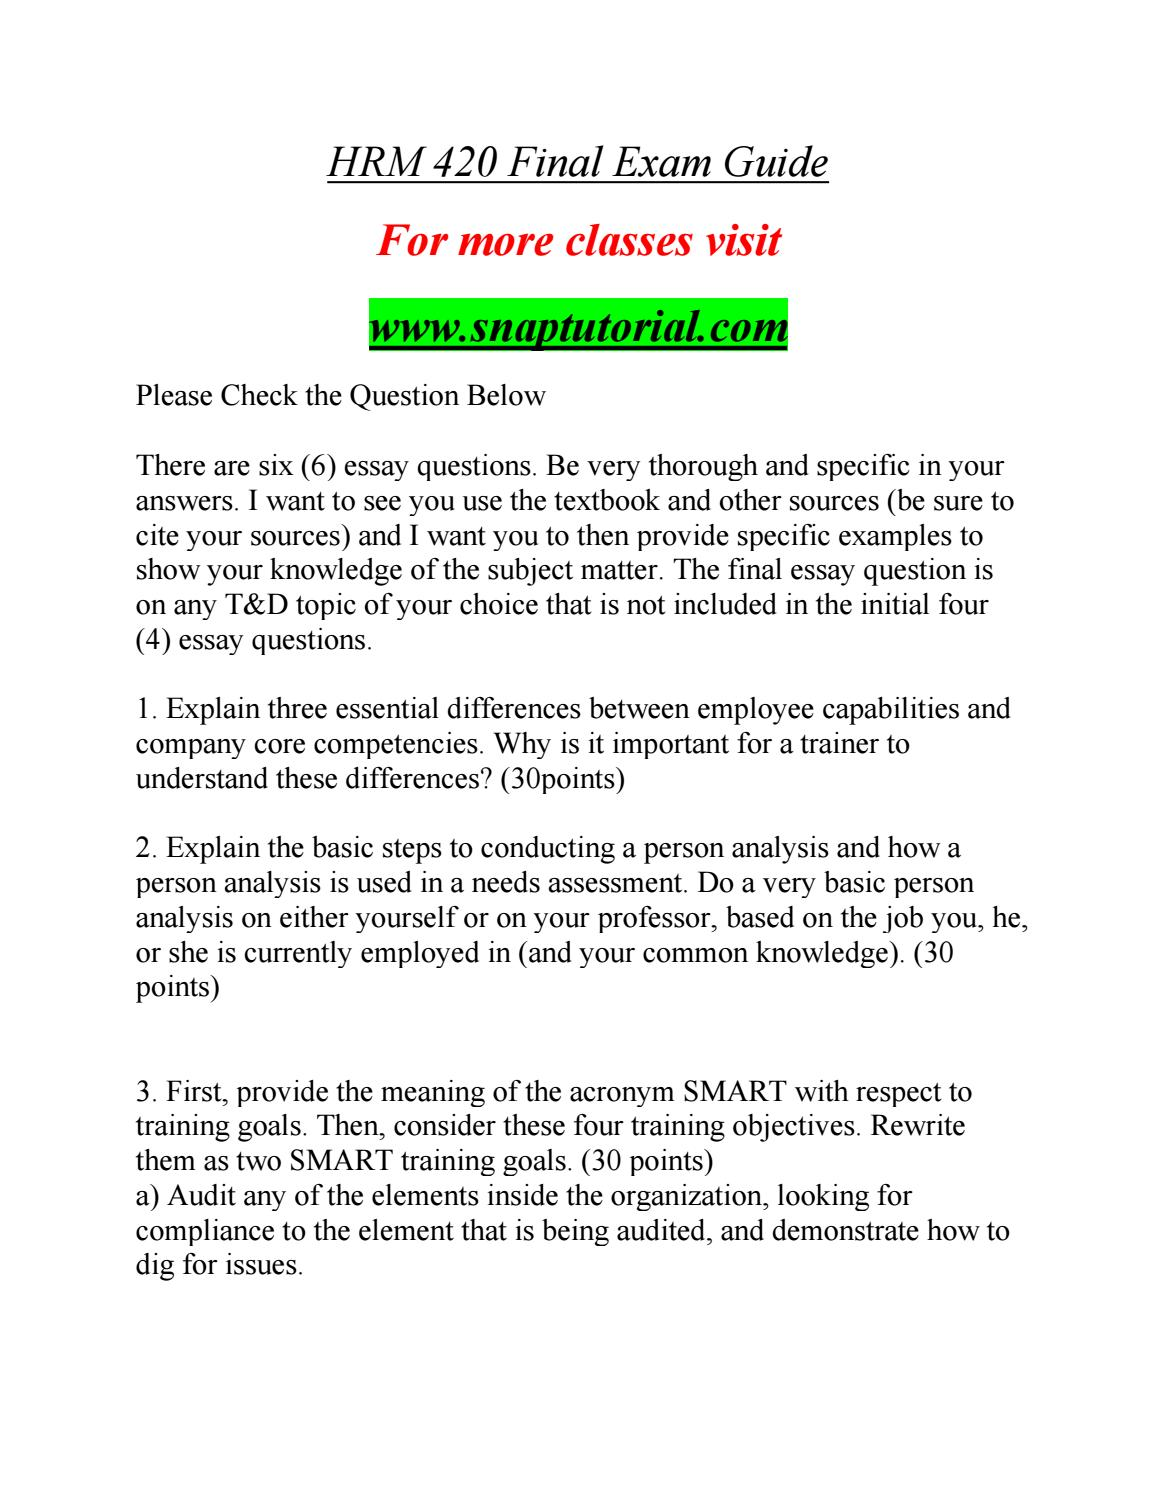 Cheap dissertation proposal ghostwriting service usa